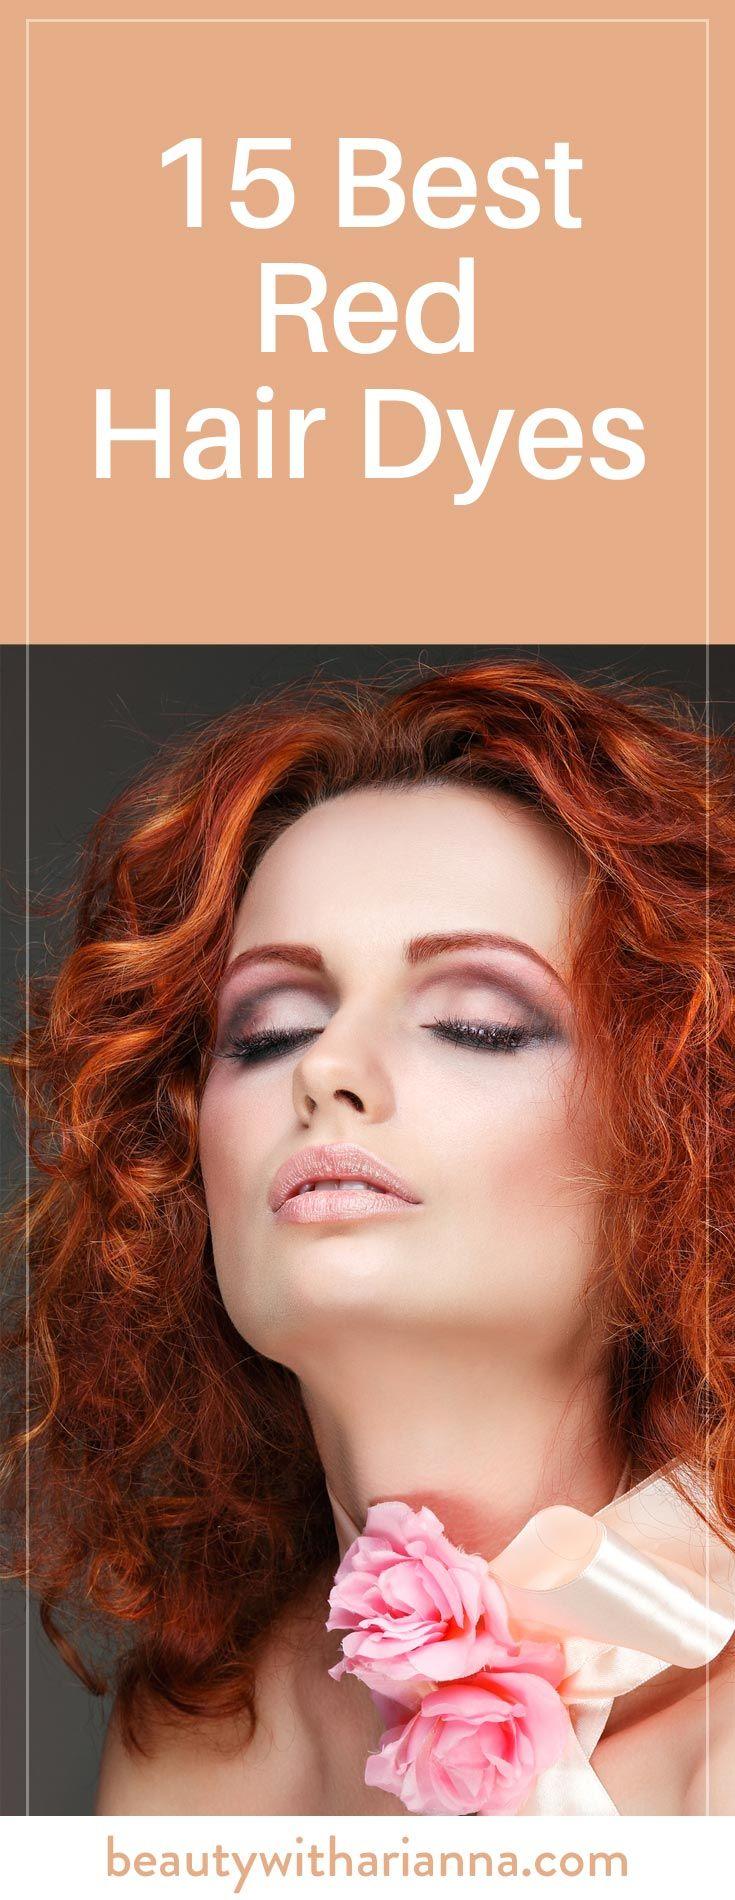 Best Red Hair Dye | Best Red Hair Color | Best Red Hair Dye Brand | Best Red Hair Dye For Fine Skin | Best Red Hair | Red Hair Dye Ideas | Red Hair Dye For Dark Hair | Red Hair Dye Brands | Red Hair Dye DIY | Red Hair Dye Bright | Red Hair Dye Natural | Red Hair Dye Best | Red Hair Dye Dark | Red Hair Dye Colors | Red Hair Dye Tips